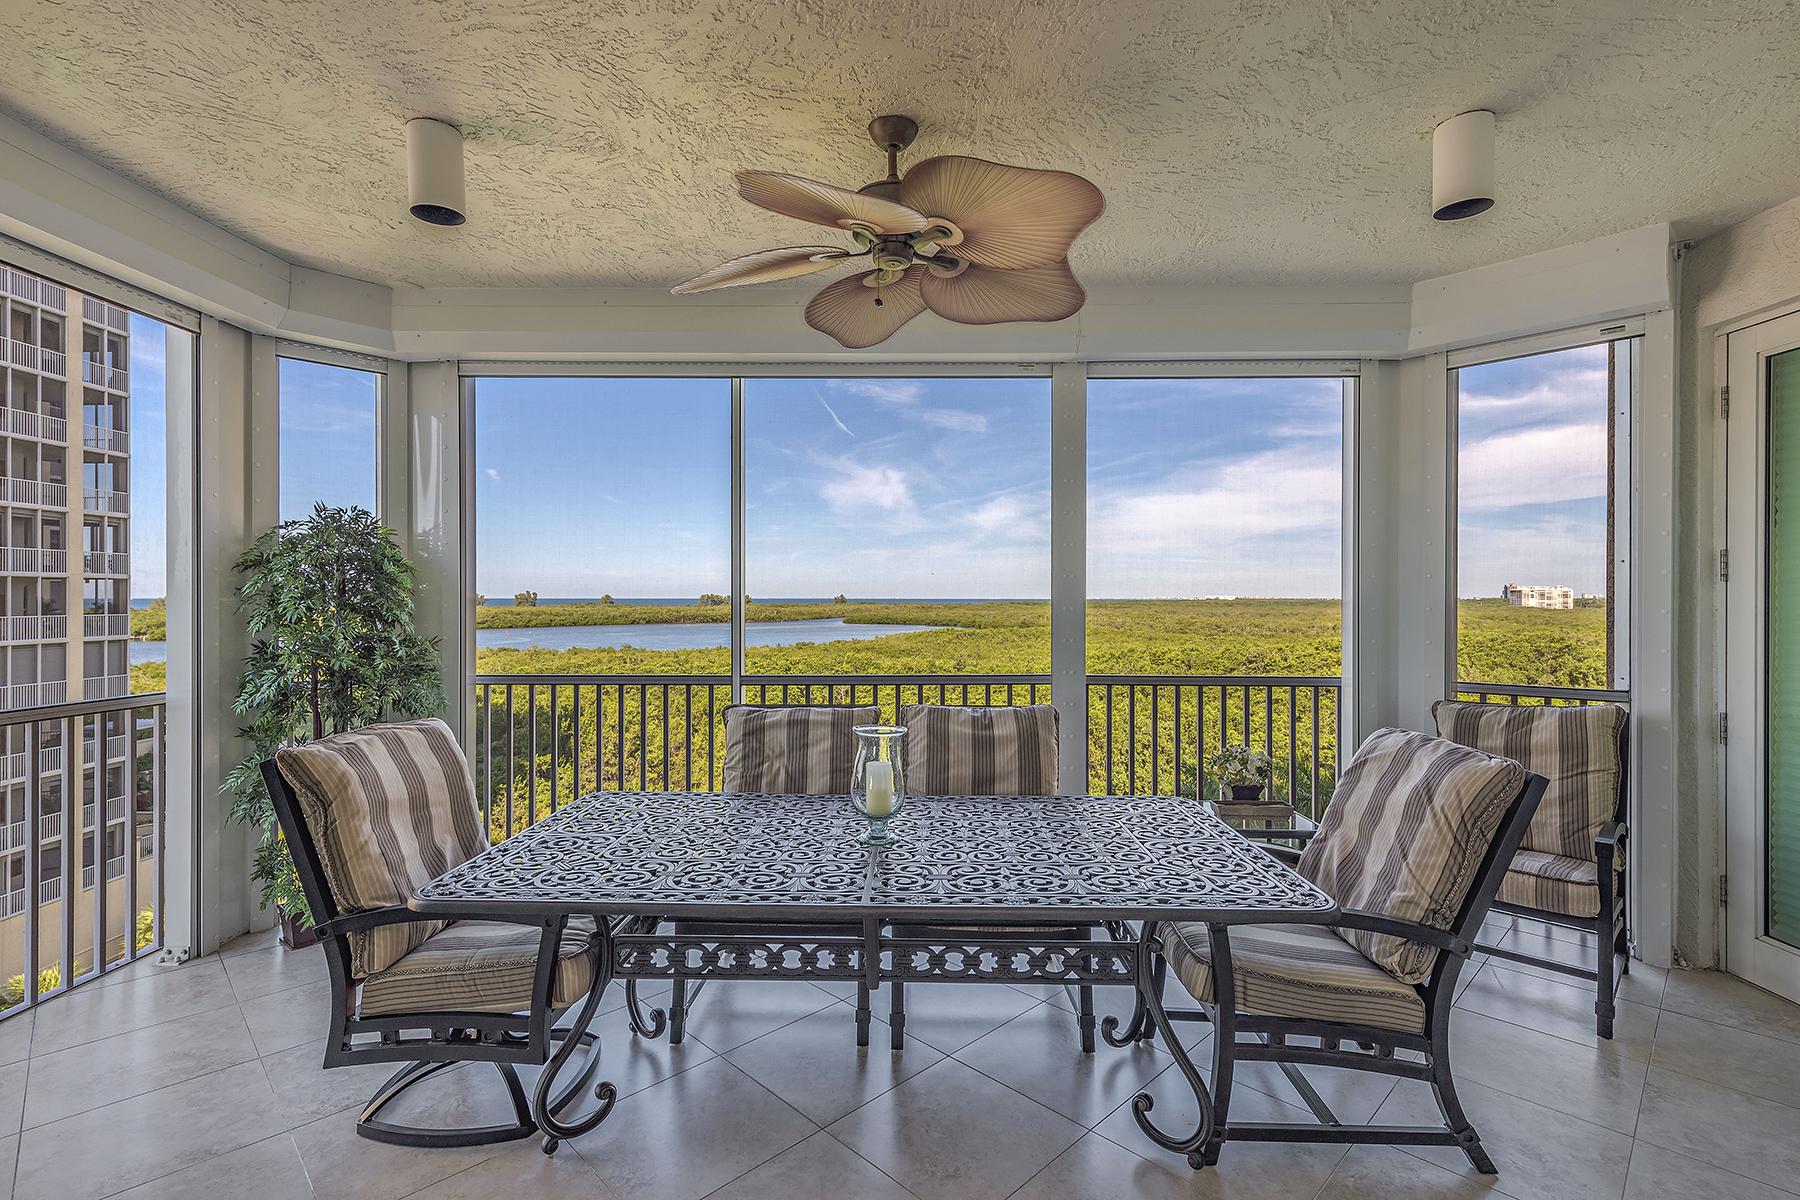 Condominium for Sale at THE DUNES - GRANDE PHOENICIAN 275 Indies Way 701 Naples, Florida, 34110 United States